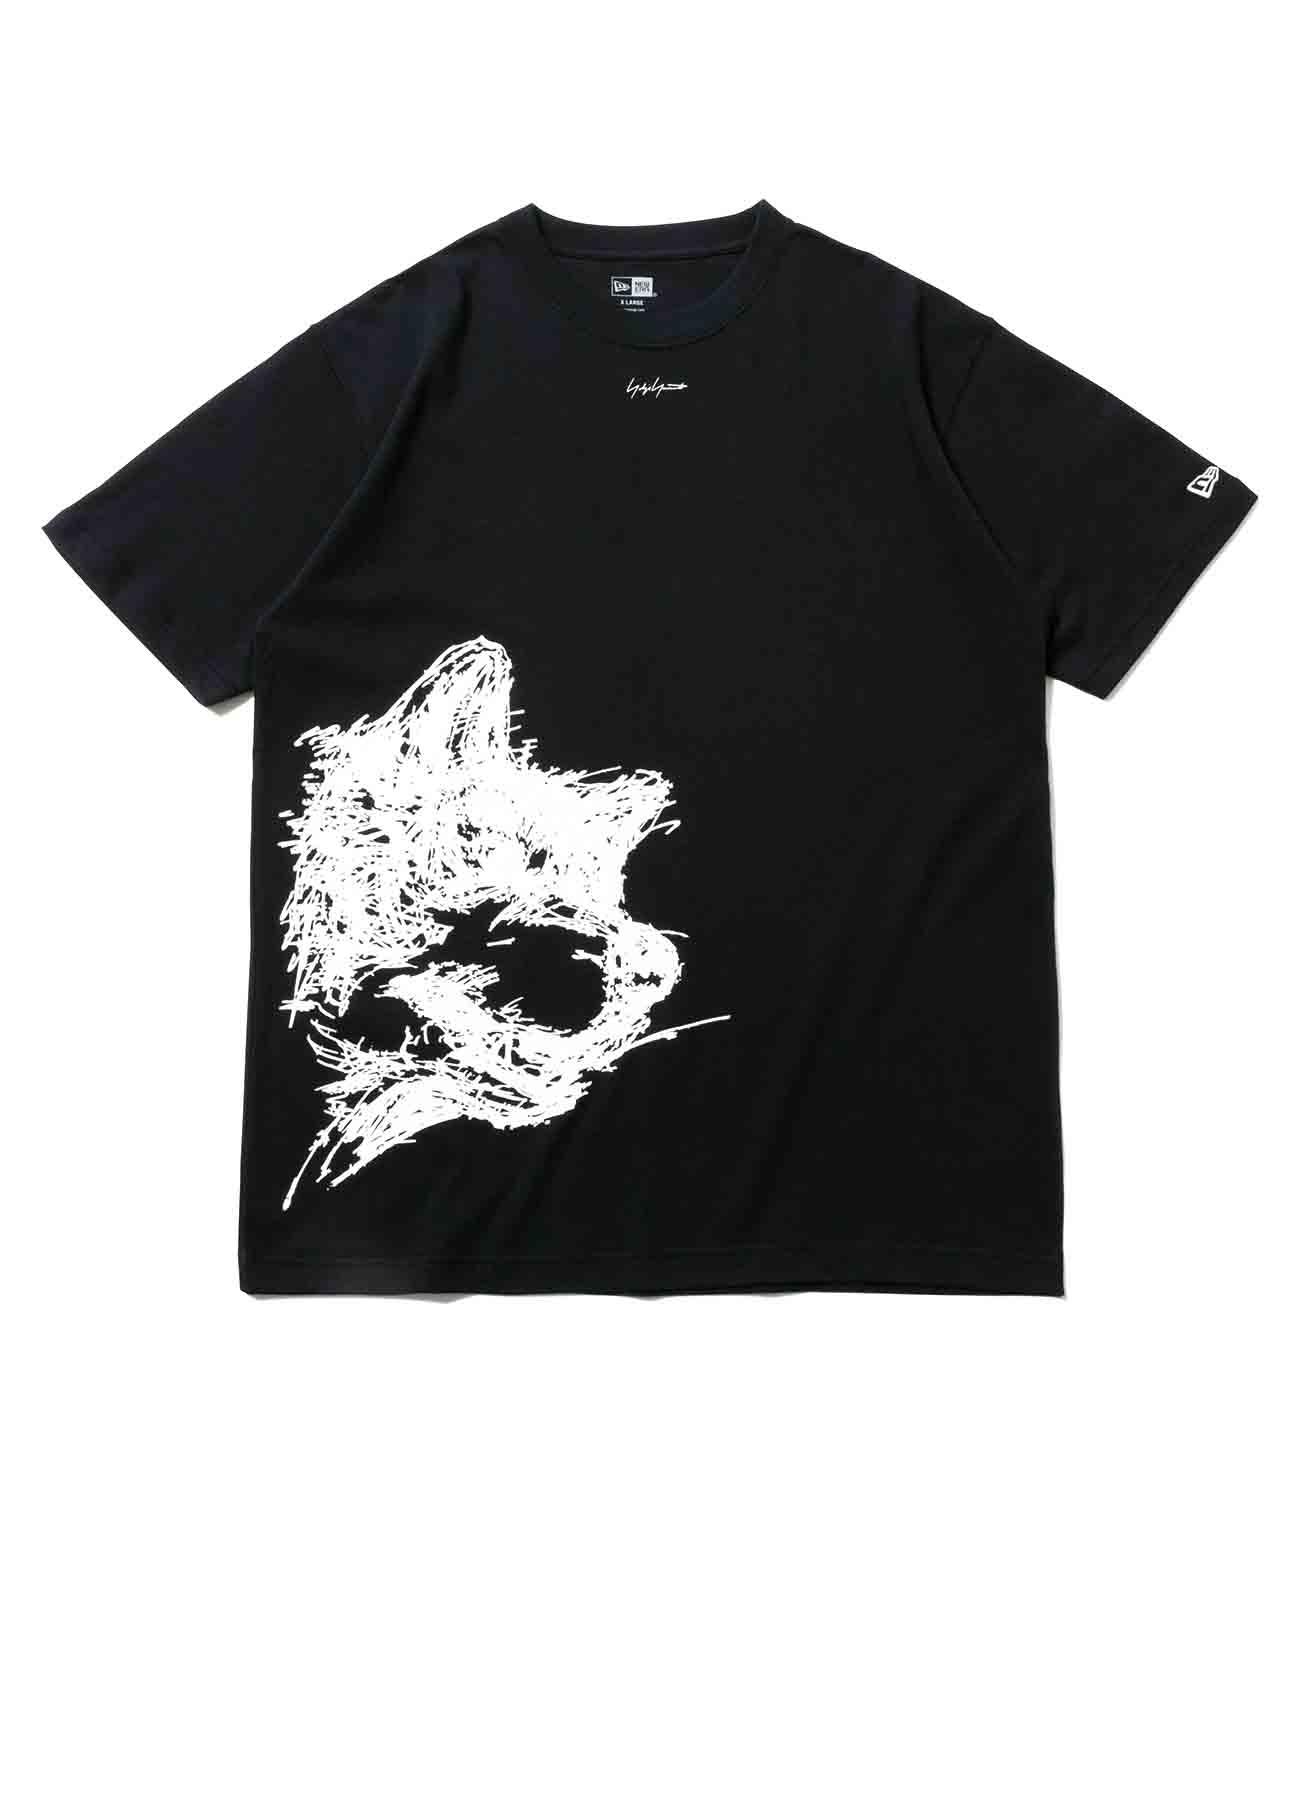 Yohji Yamamoto × New Era S/S RIN PRINT COTTON TEE